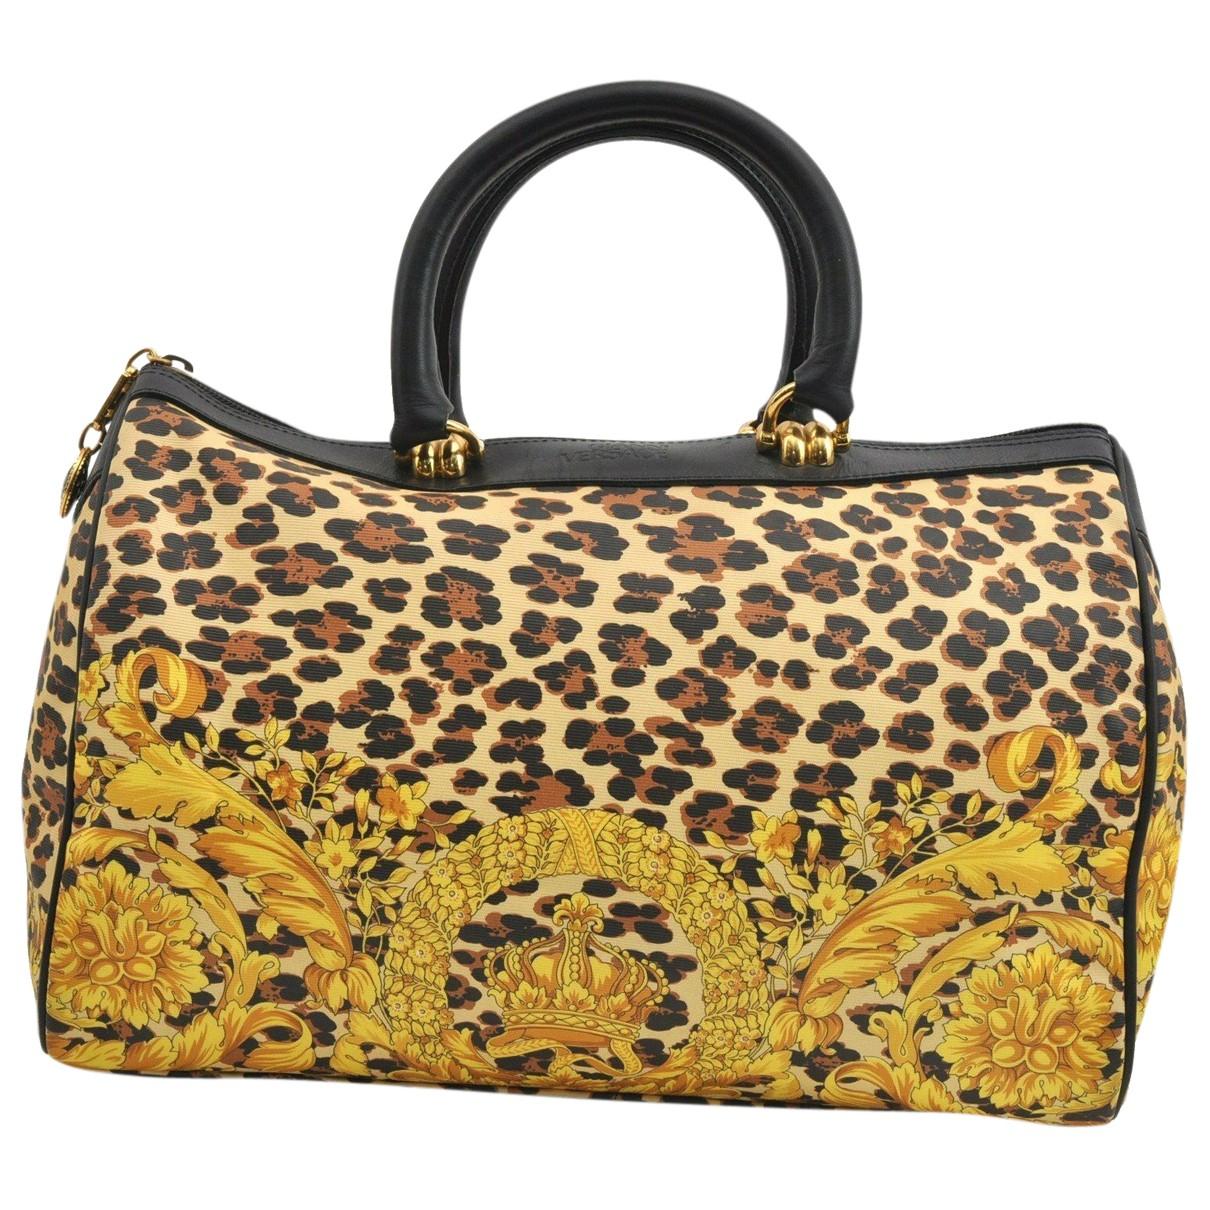 Gianni Versace \N Handtasche in  Gelb Leder